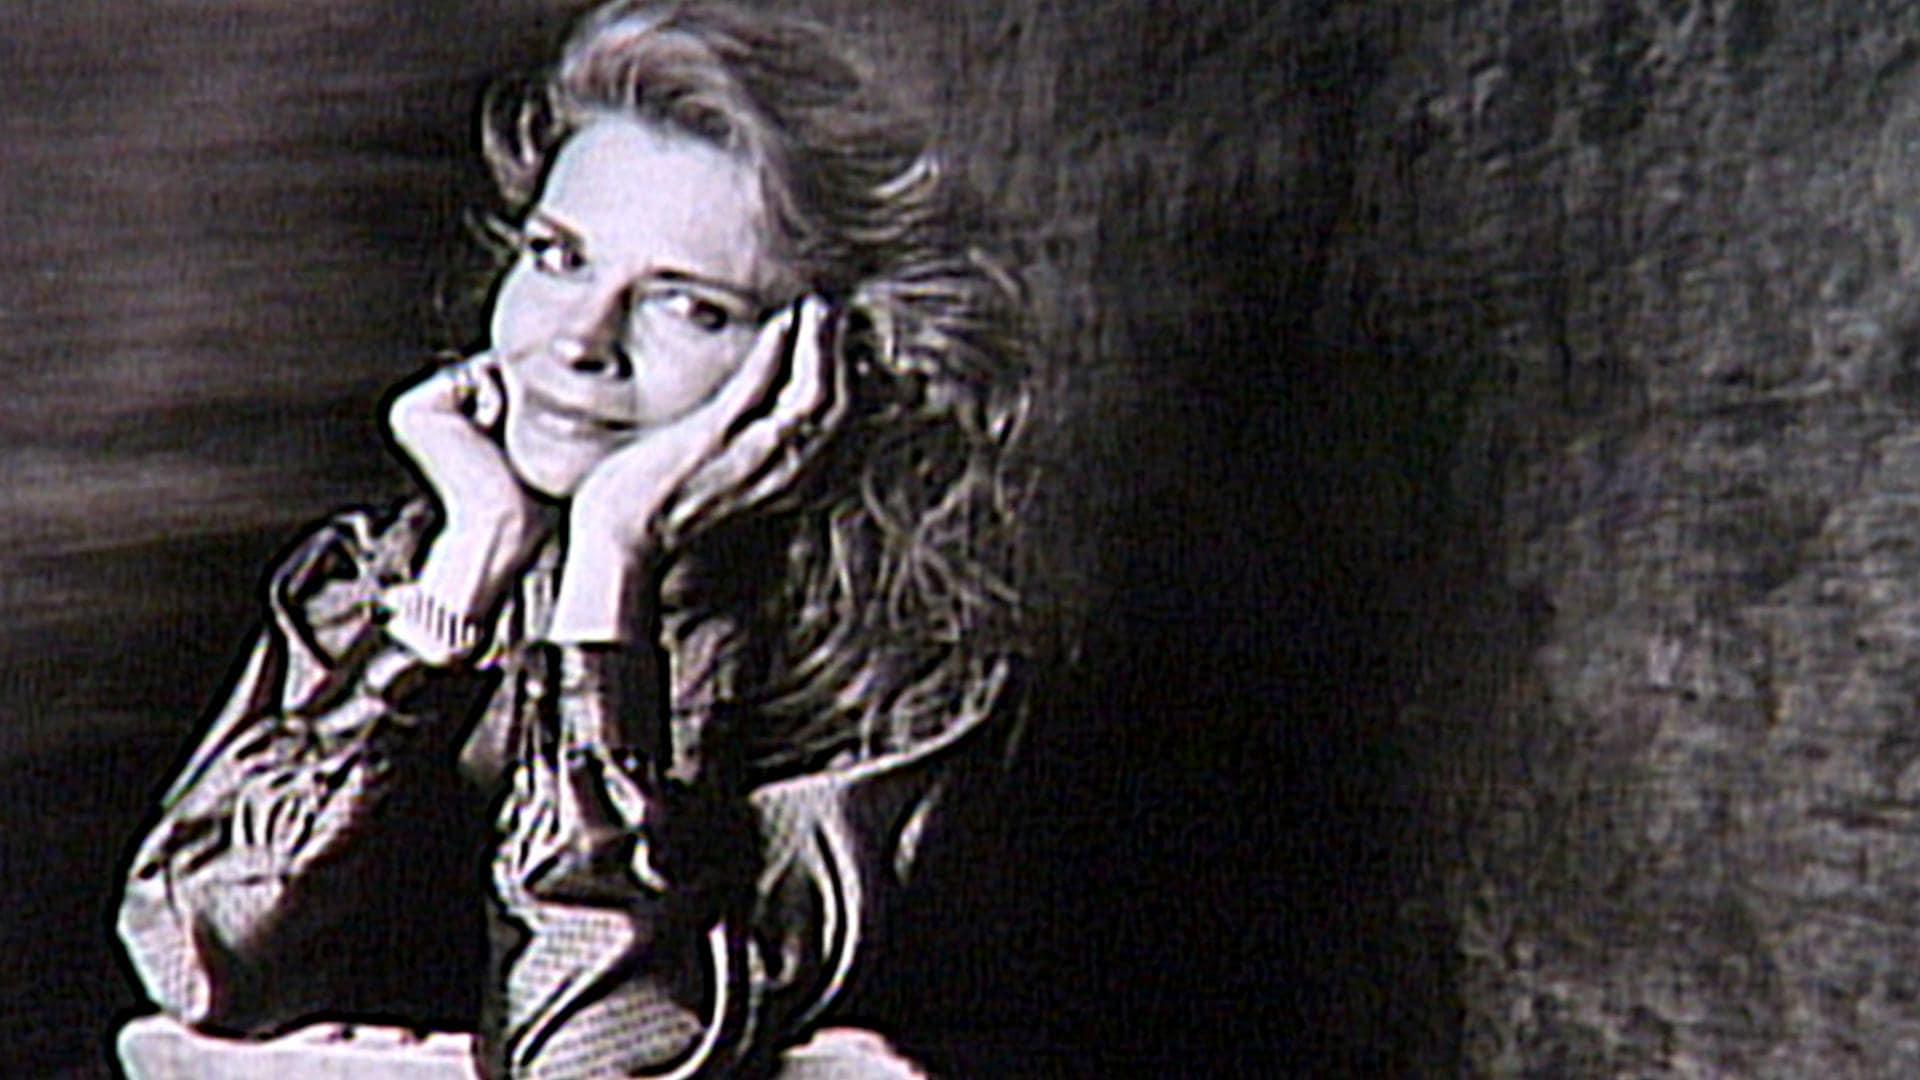 Candice Bergen: November 21, 1987